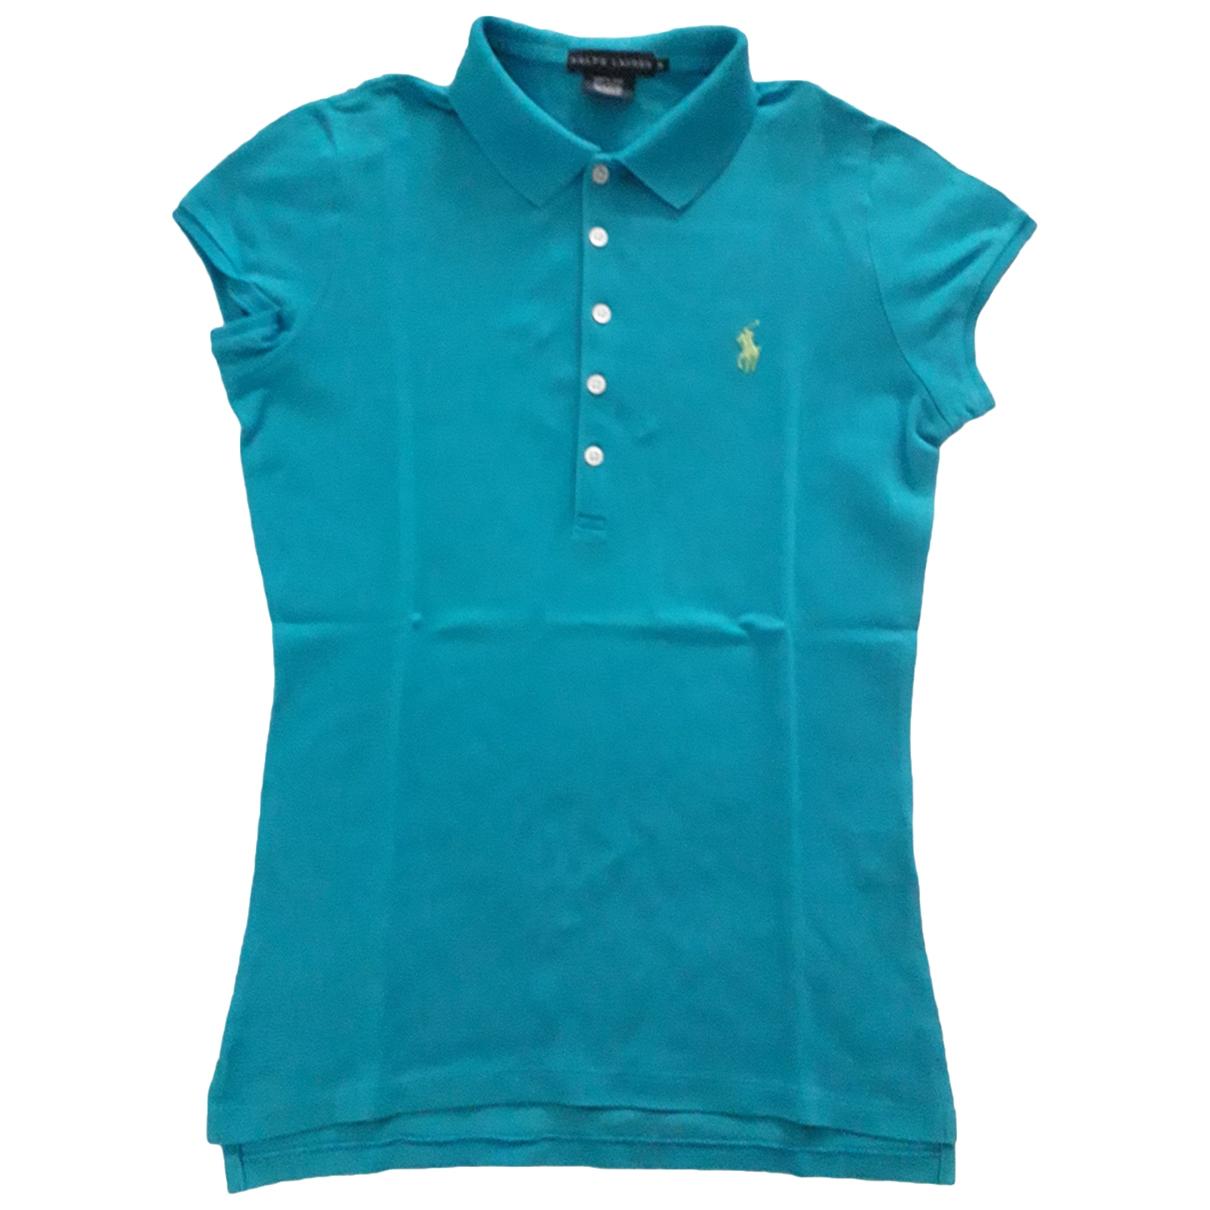 Ralph Lauren \N Turquoise Cotton Knitwear for Women M International